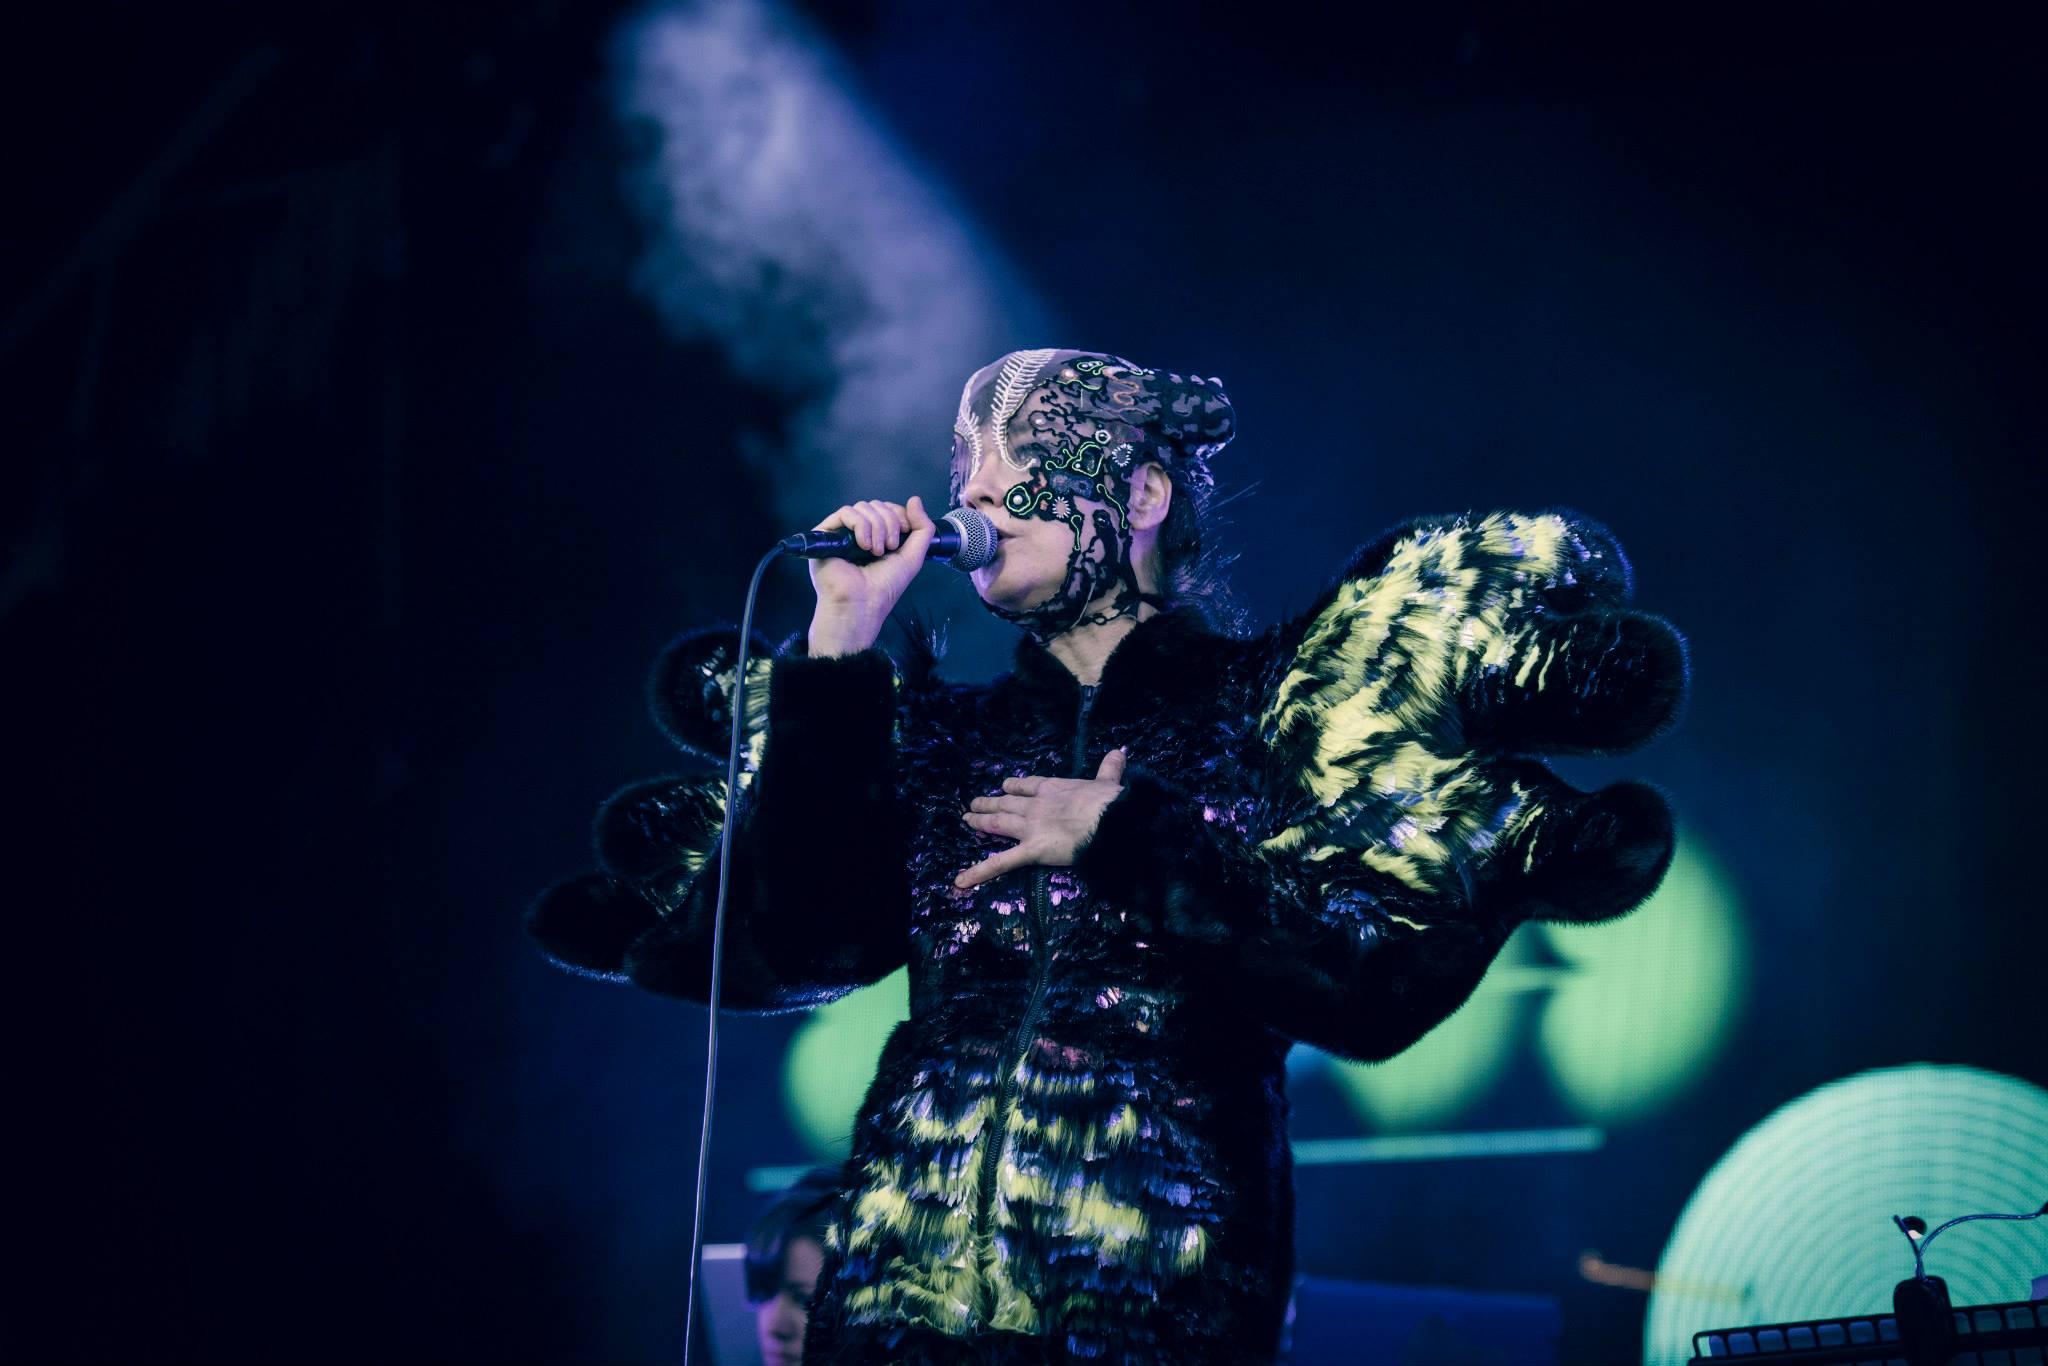 Gira ''Vulnicura'' - Página 2 05-07-2015-bjork-castlefield-arena-_13_